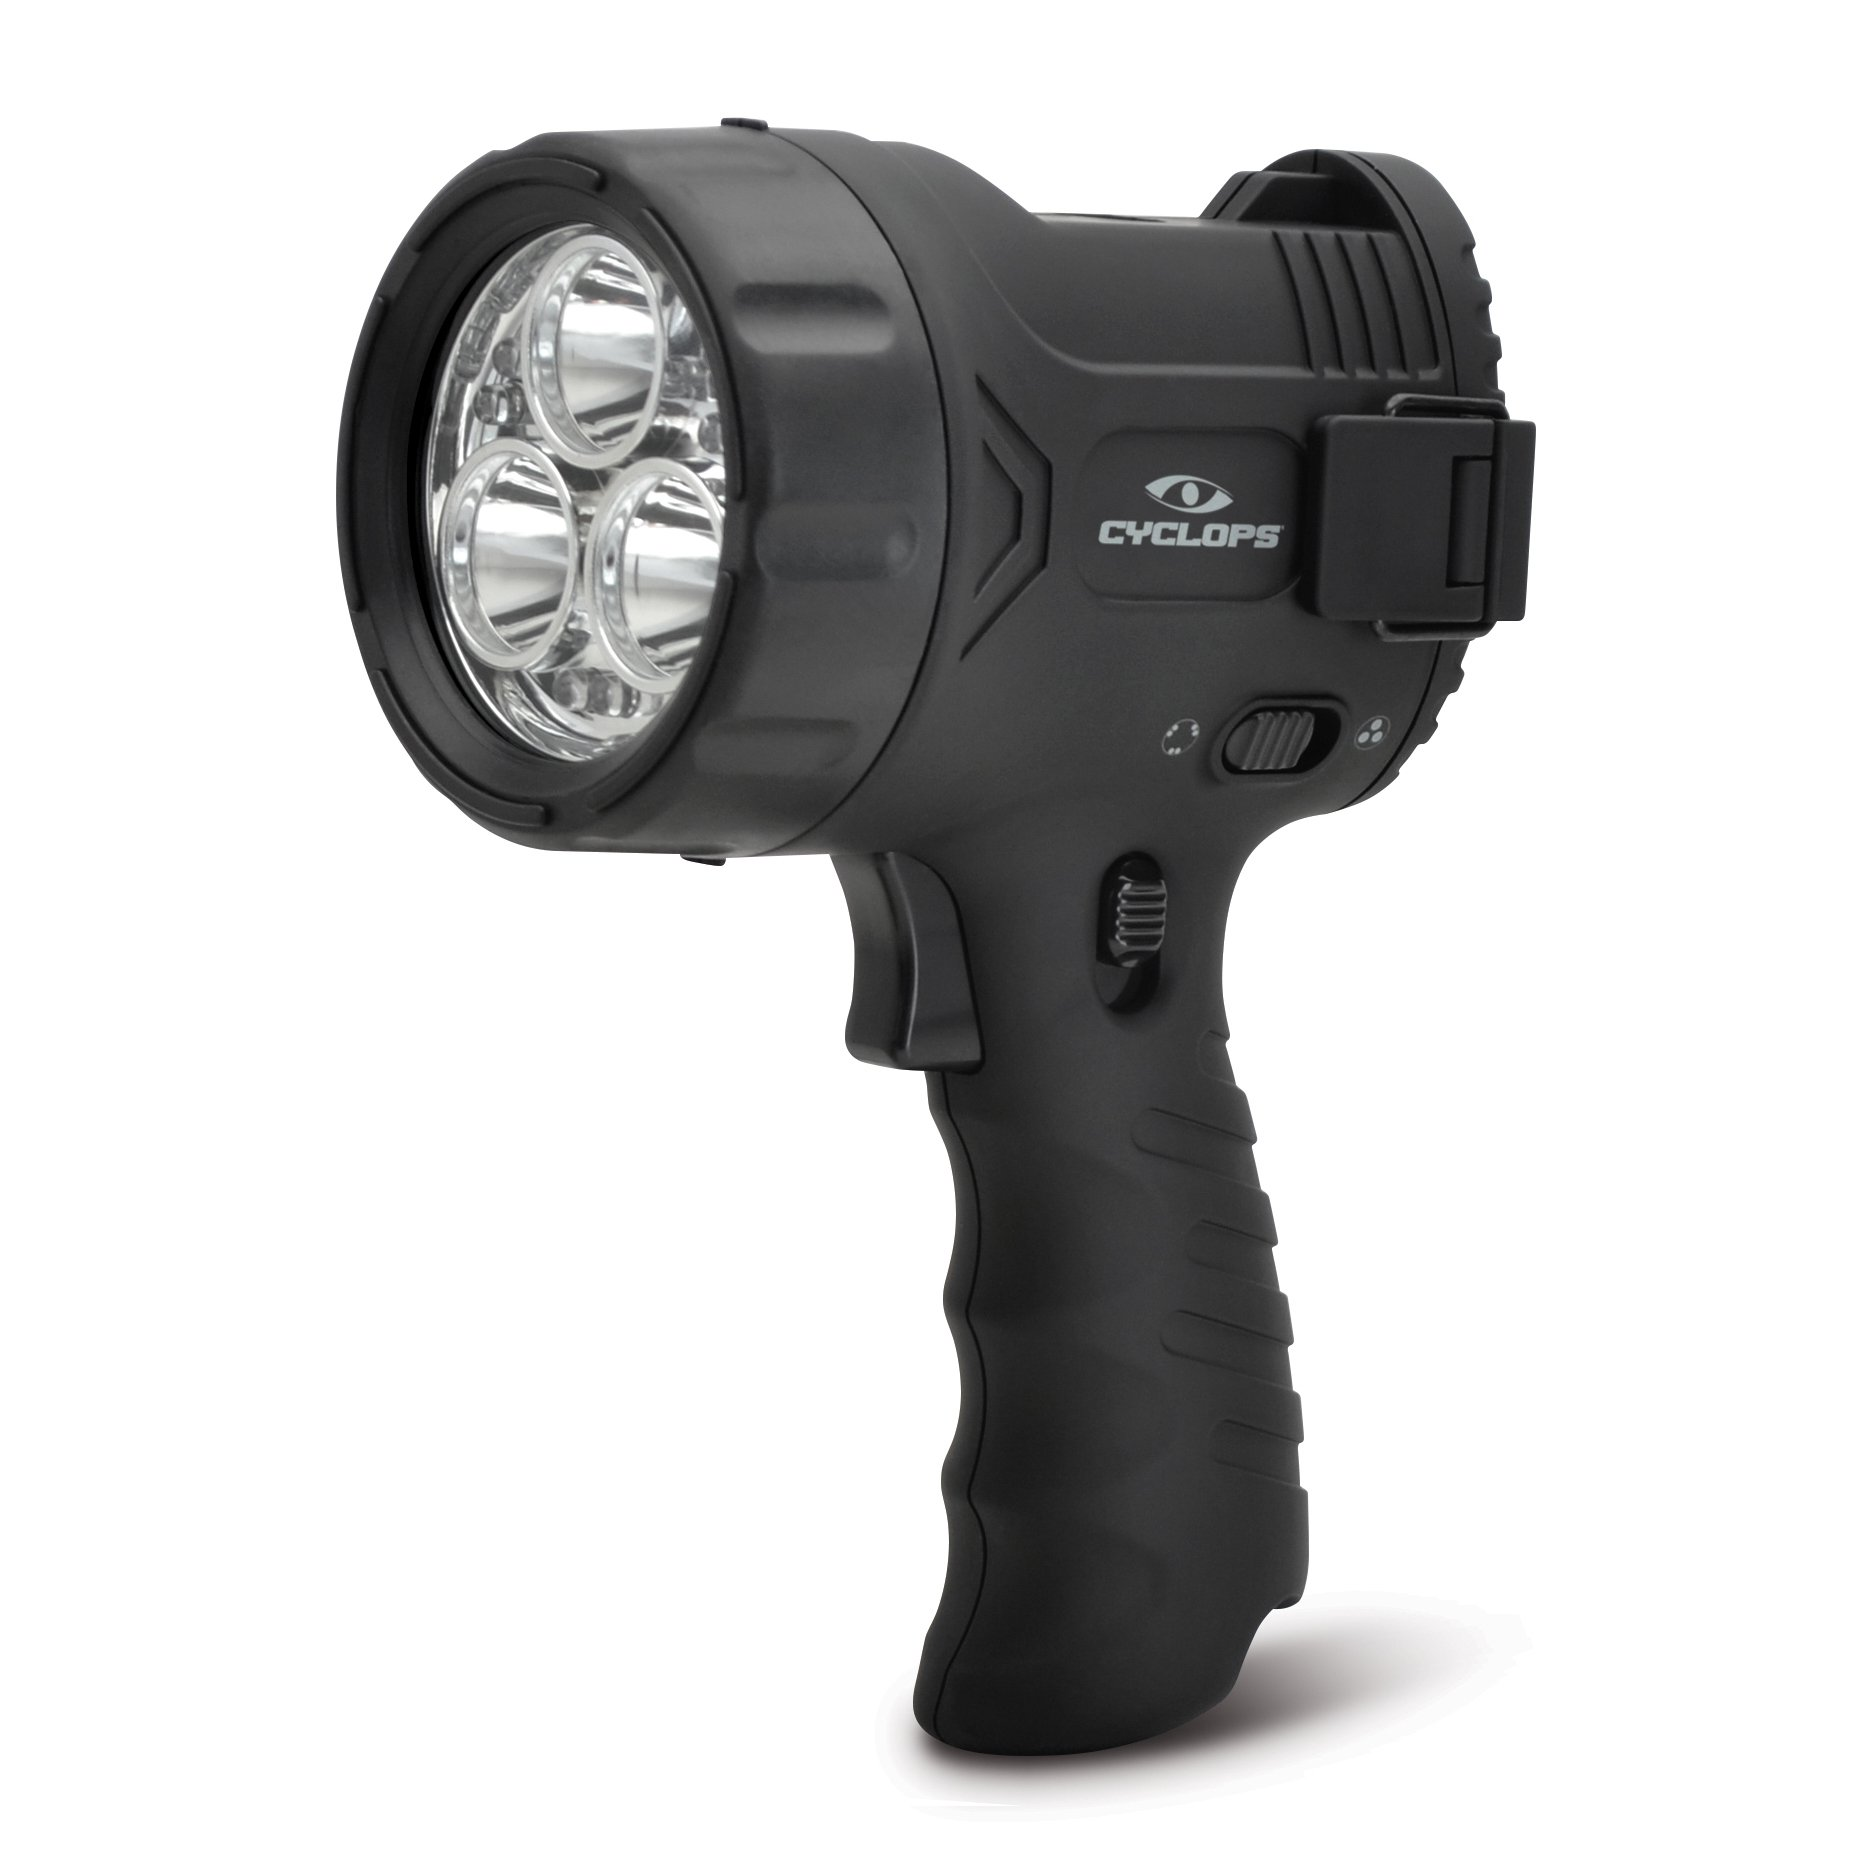 Cyclops Flare 3 Watt Handheld Spot Light